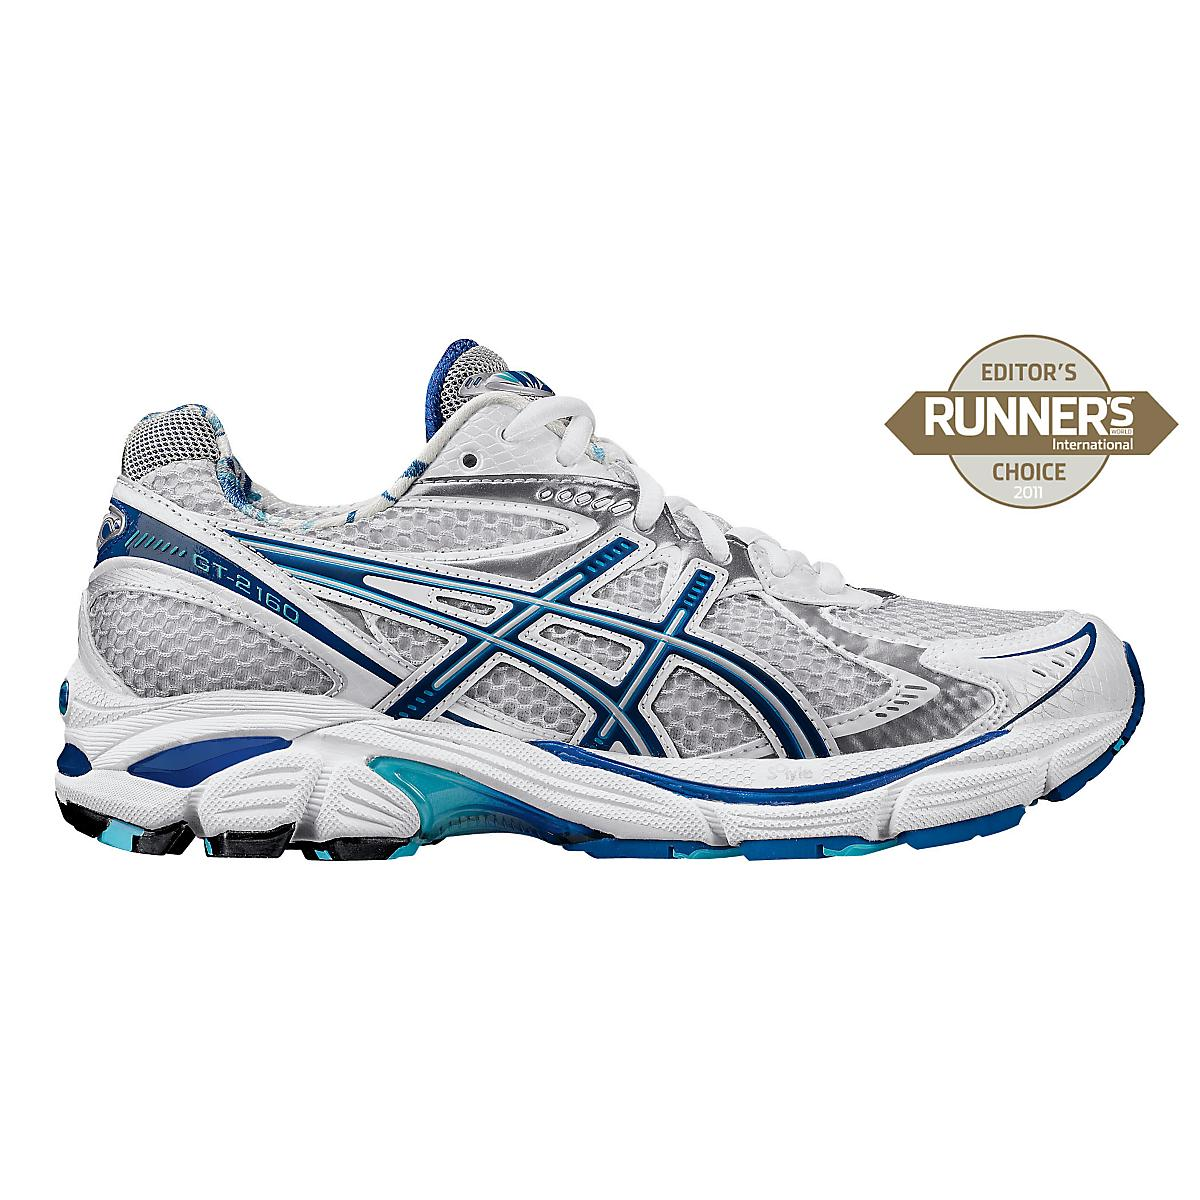 Womens ASICS GT-2160 Running Shoe At Road Runner Sports